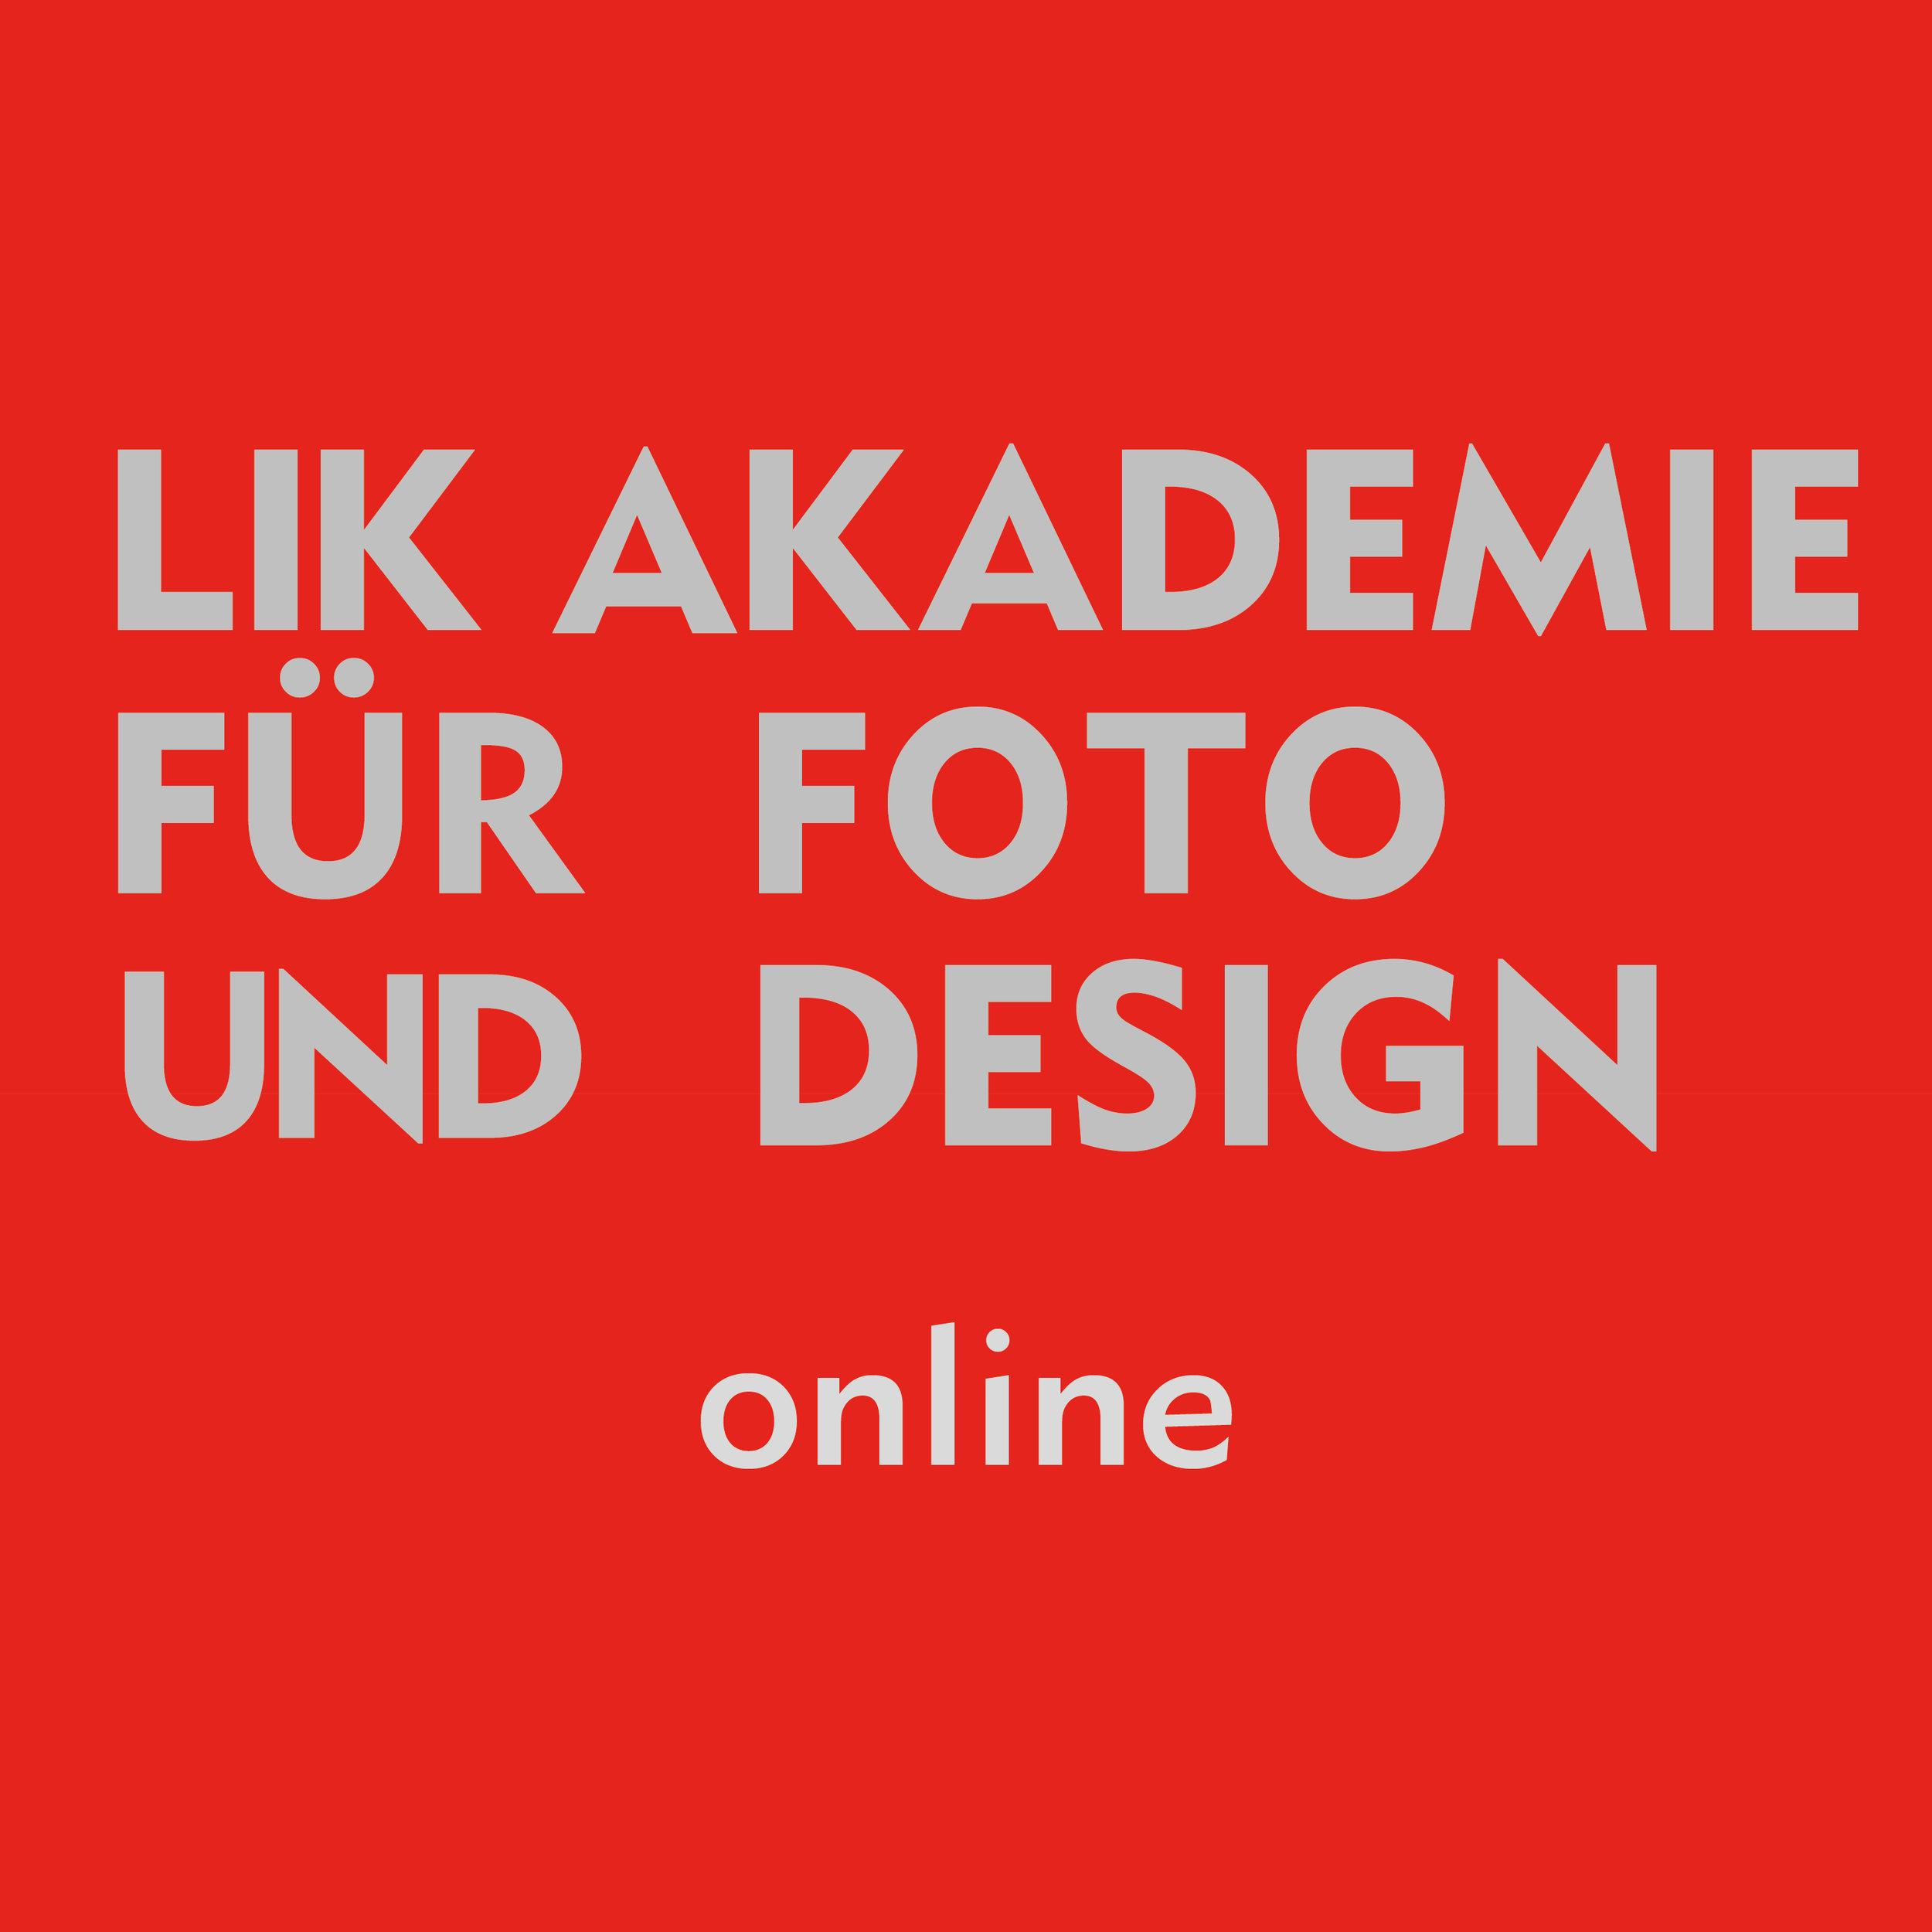 LIK Online Fernstudium